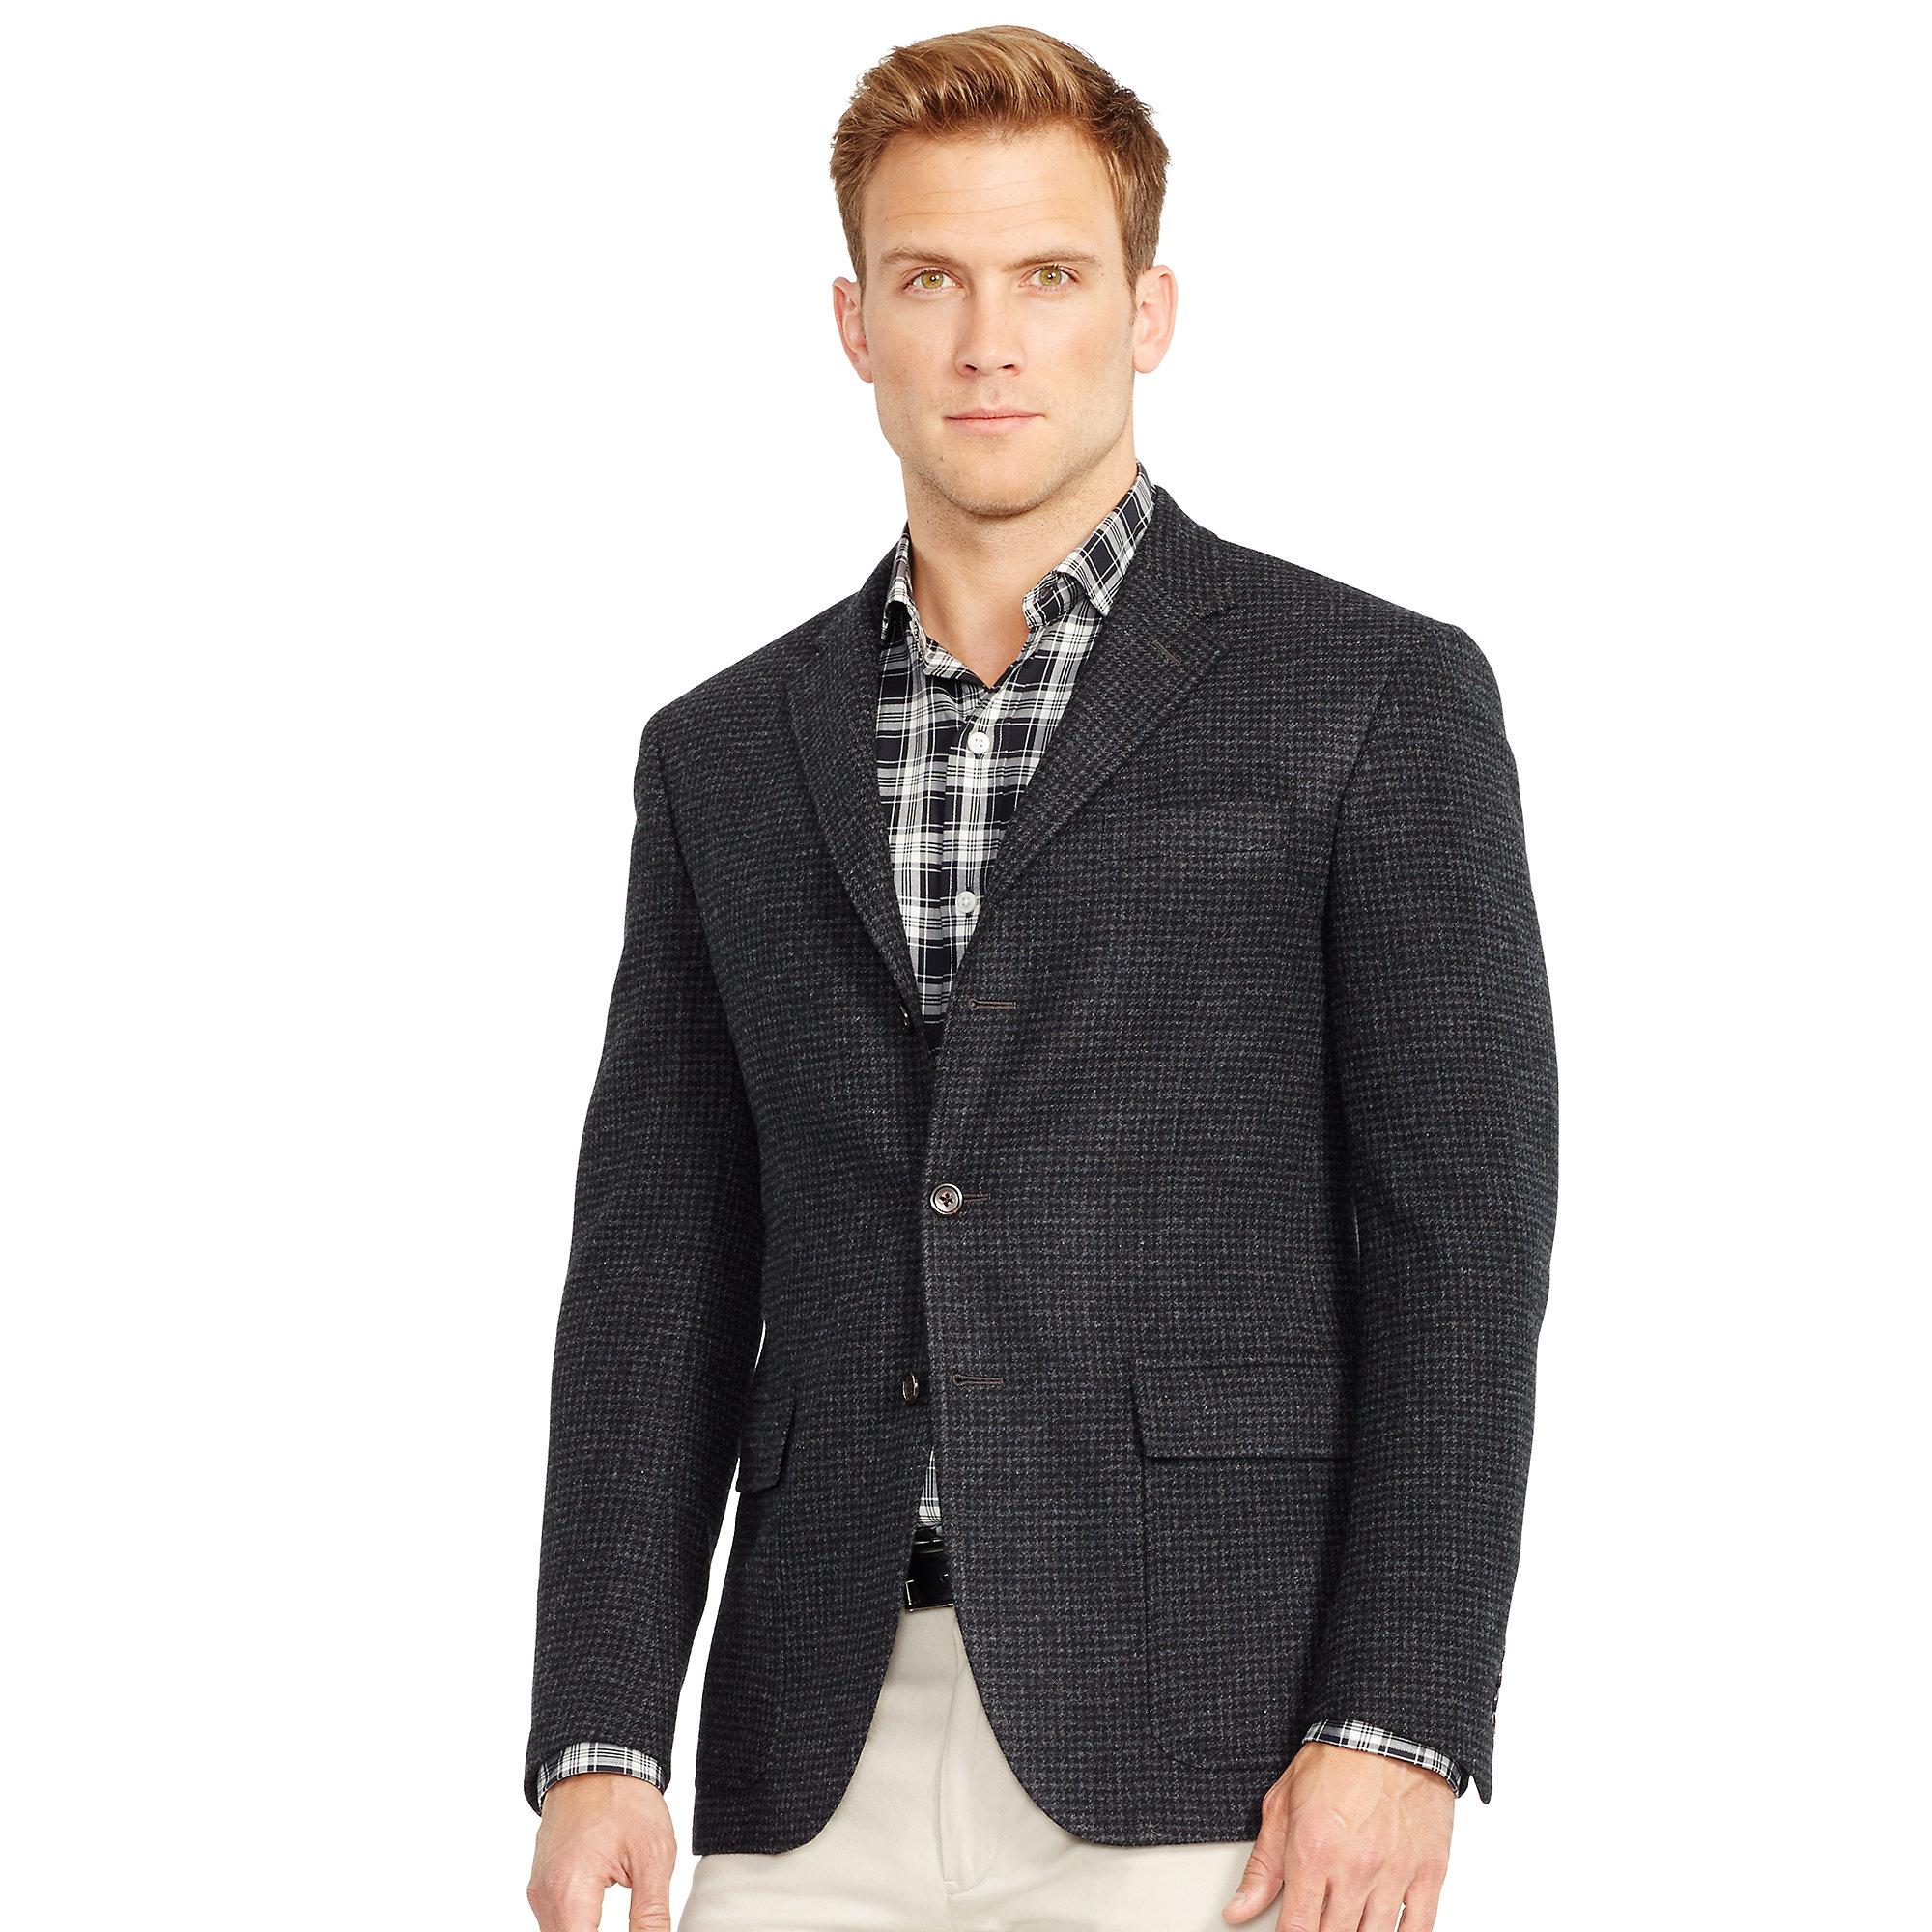 Polo ralph lauren Polo Houndstooth Sport Coat in Gray for Men | Lyst